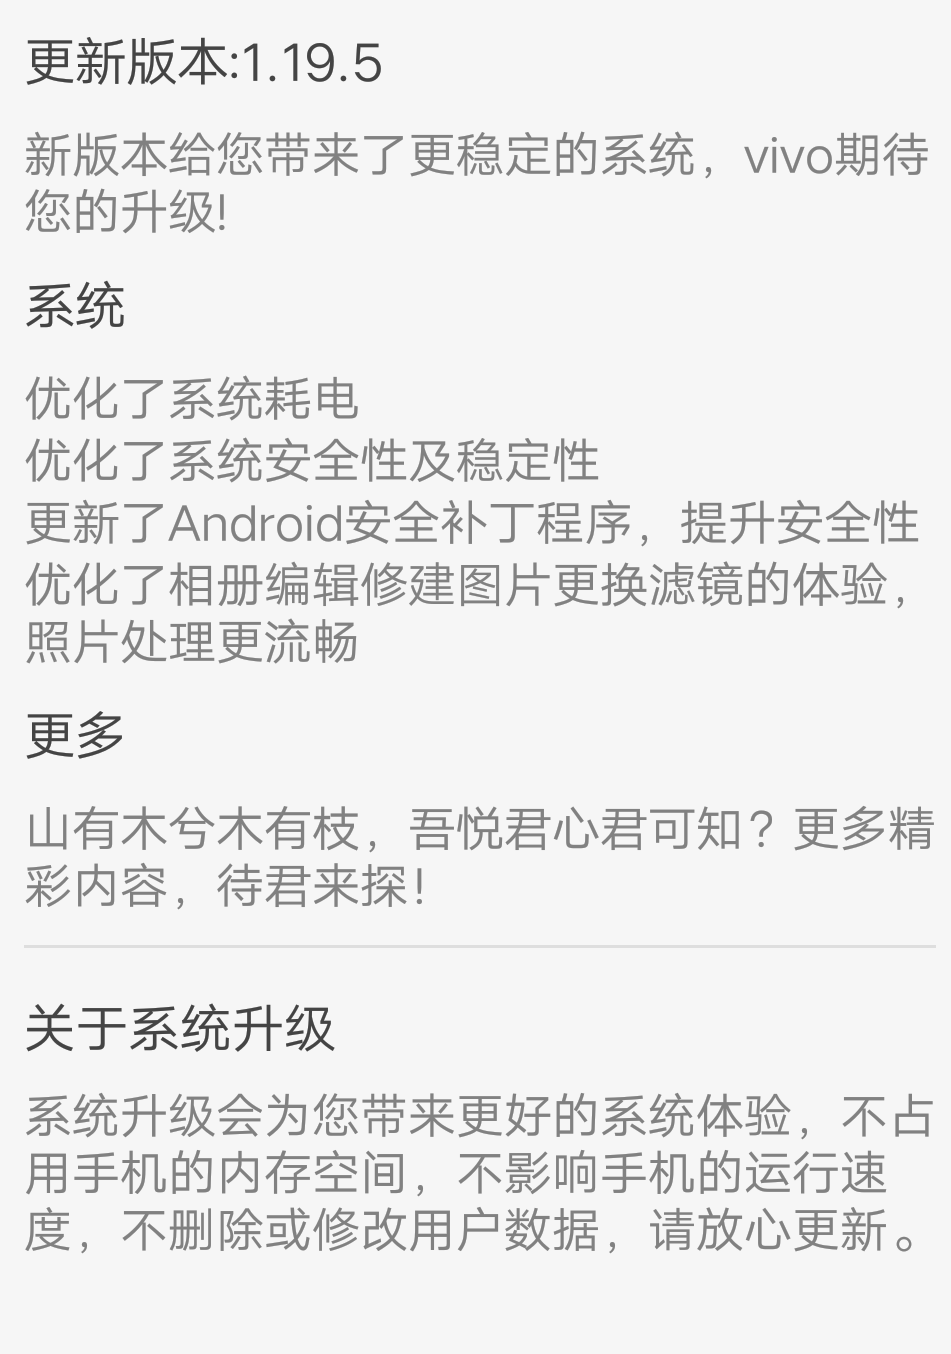 Screenshot_2019_0817_125327.png